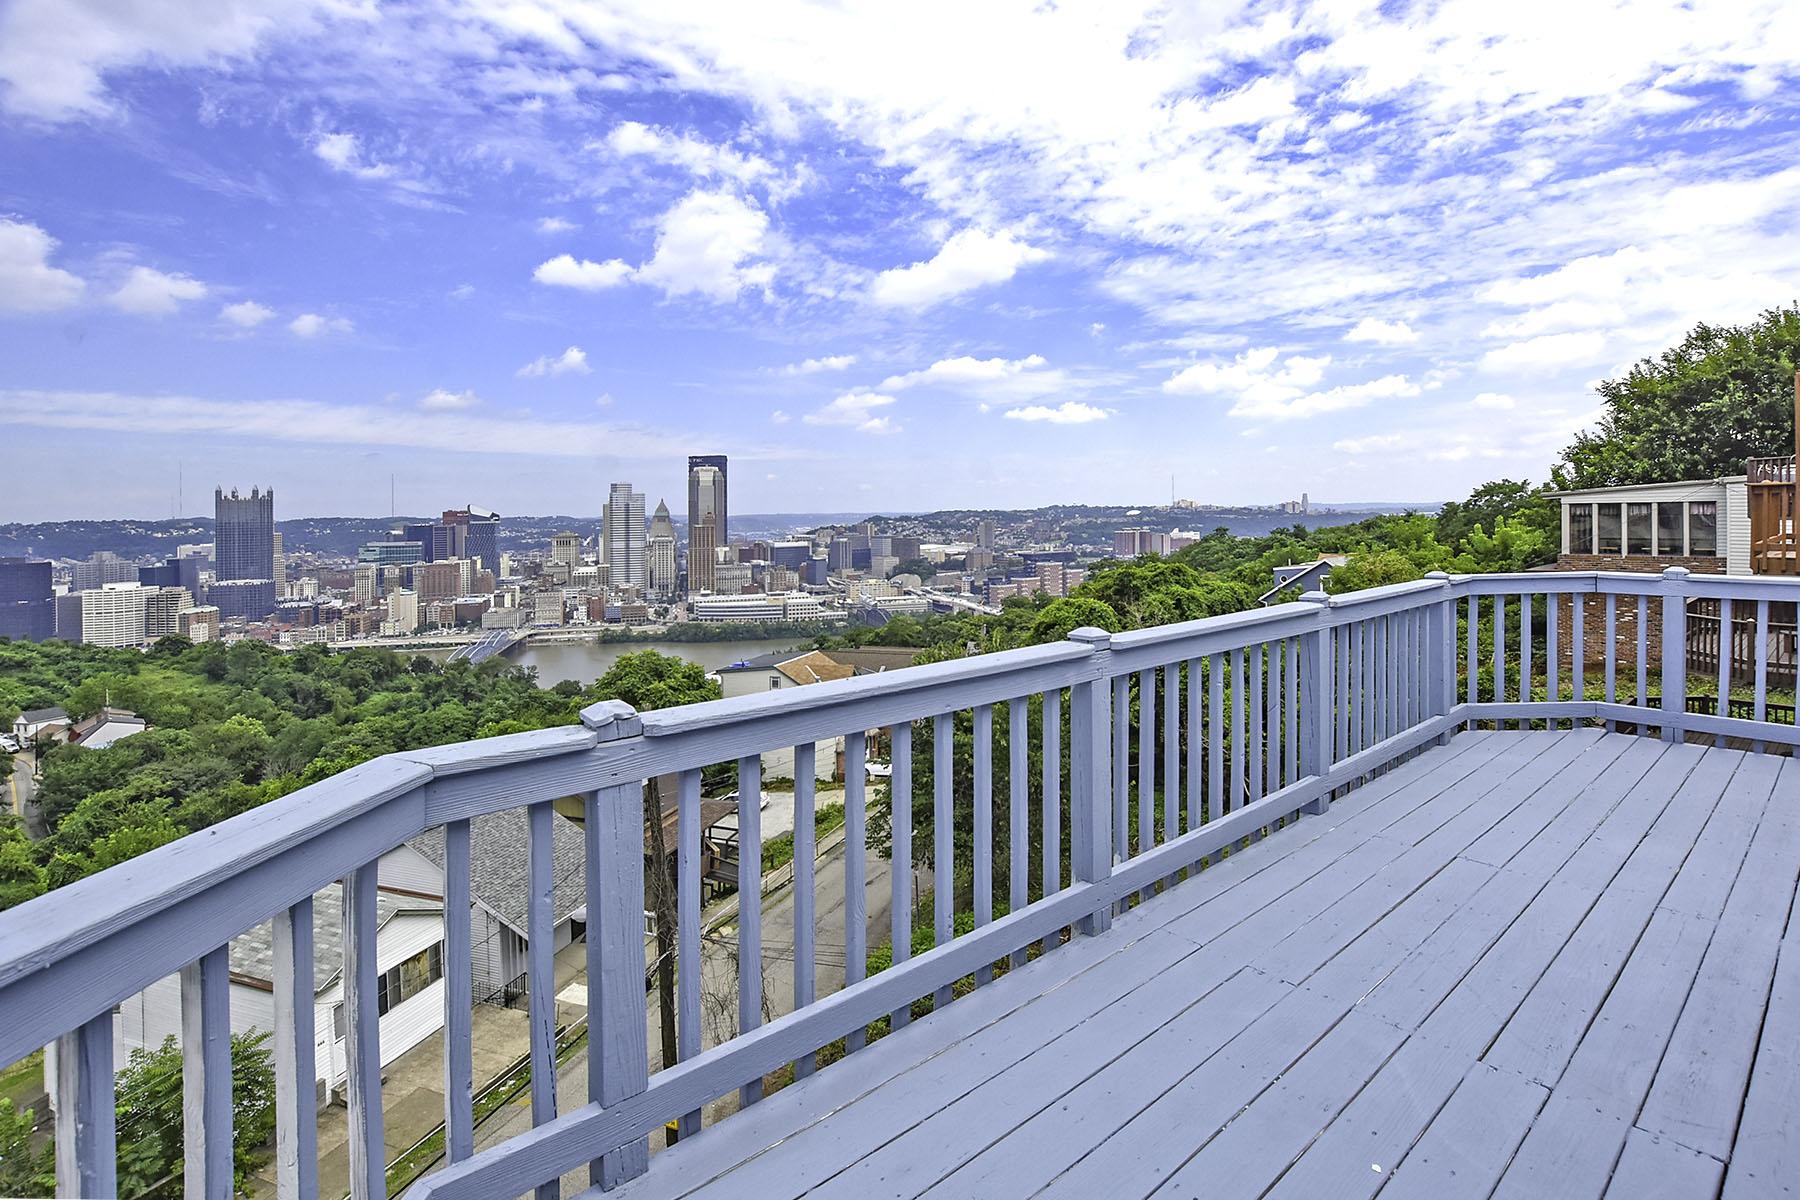 شقة للـ Rent في Renovated Mt. Washington Apartment with Panoramic City Views 15 Bailey Avenue Pittsburgh, Pennsylvania, 15211 United States